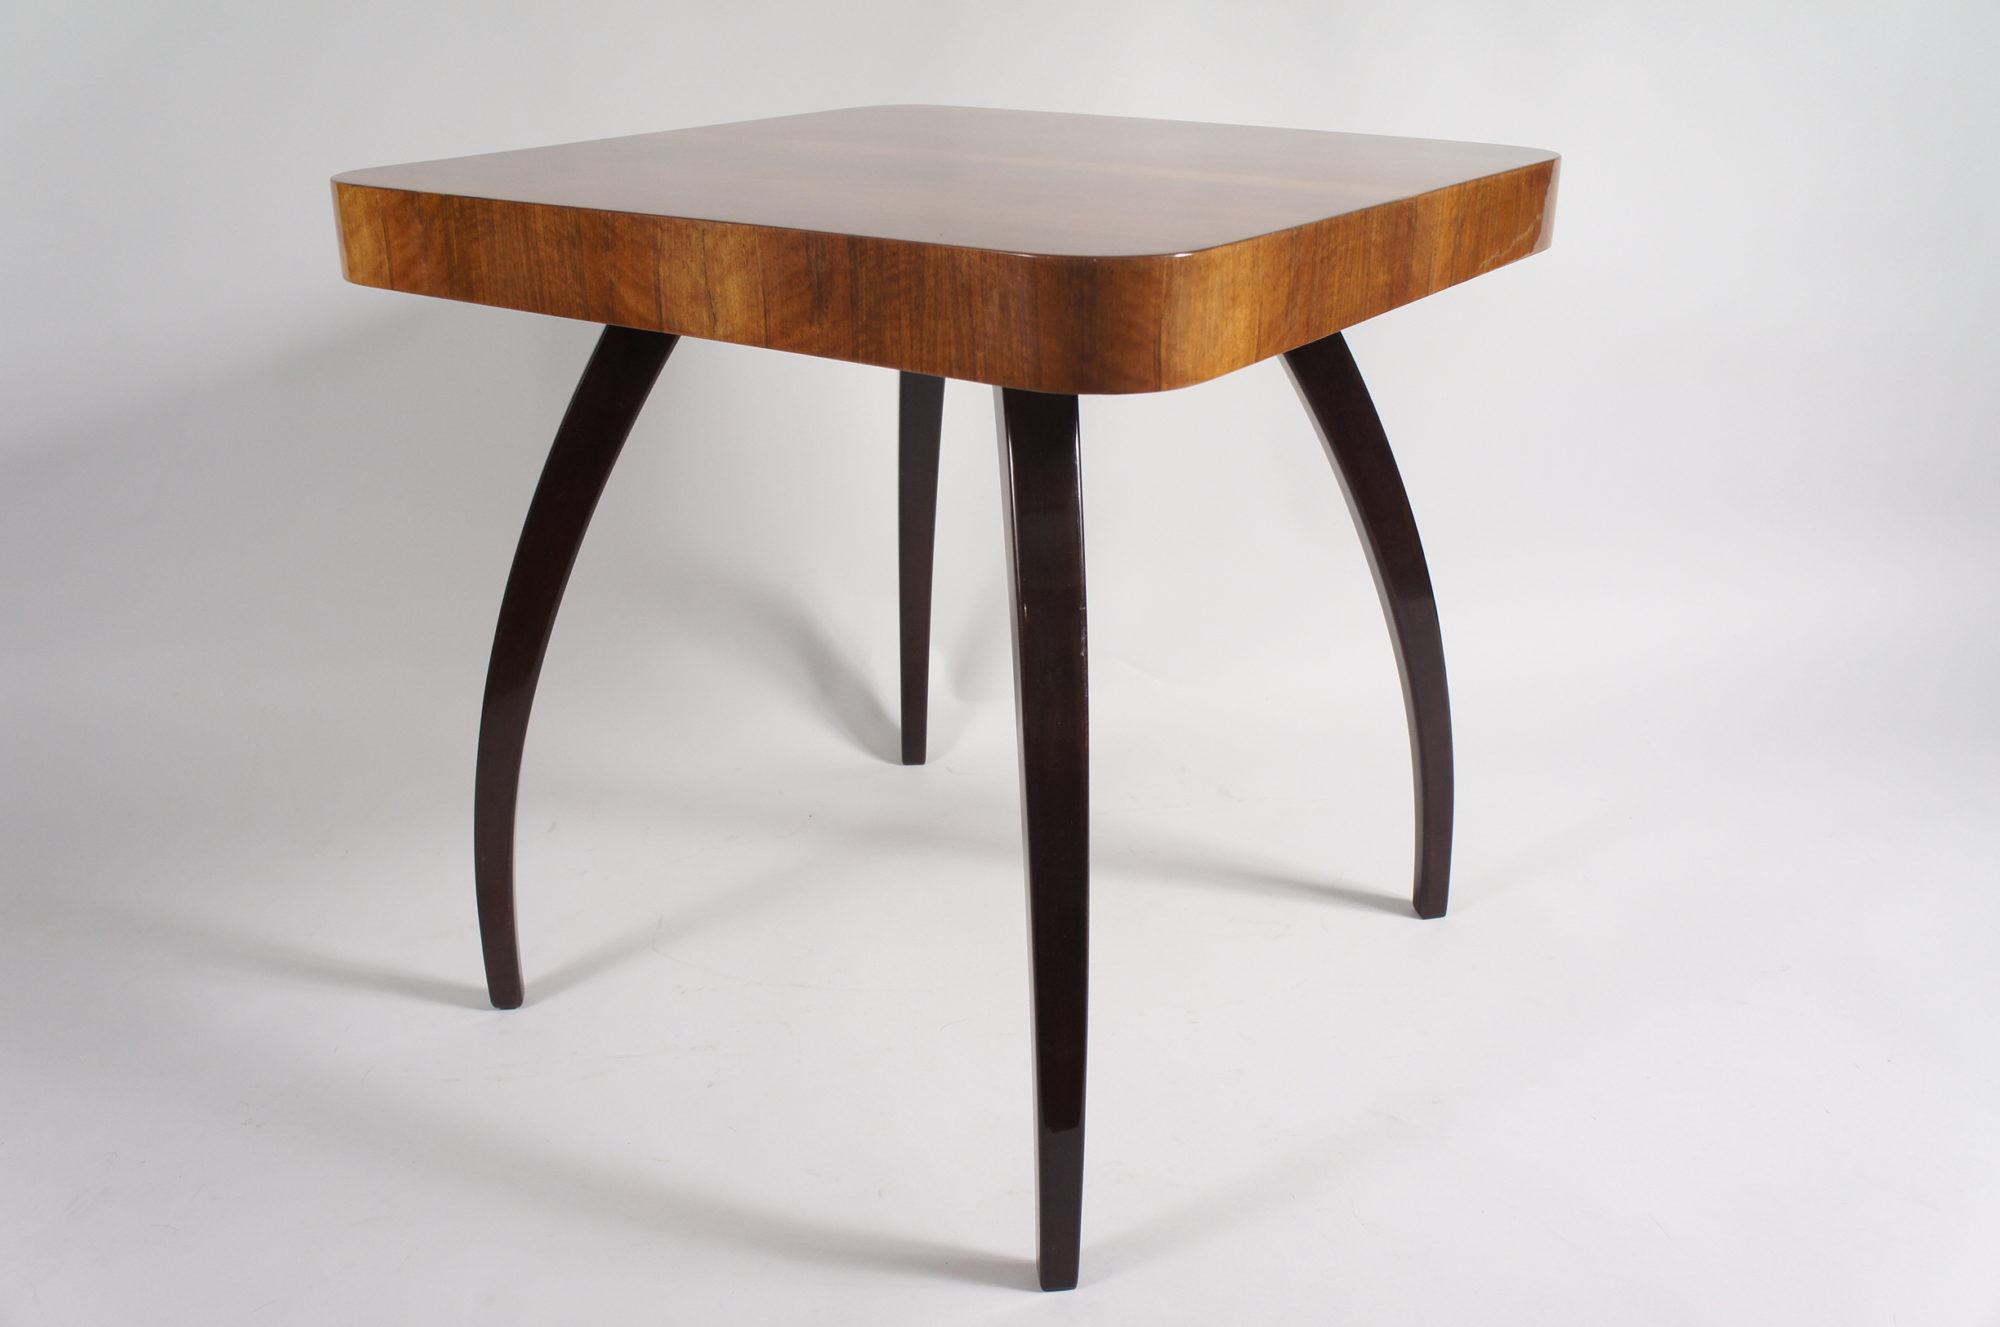 Spider side Table by Jindřich Halabala